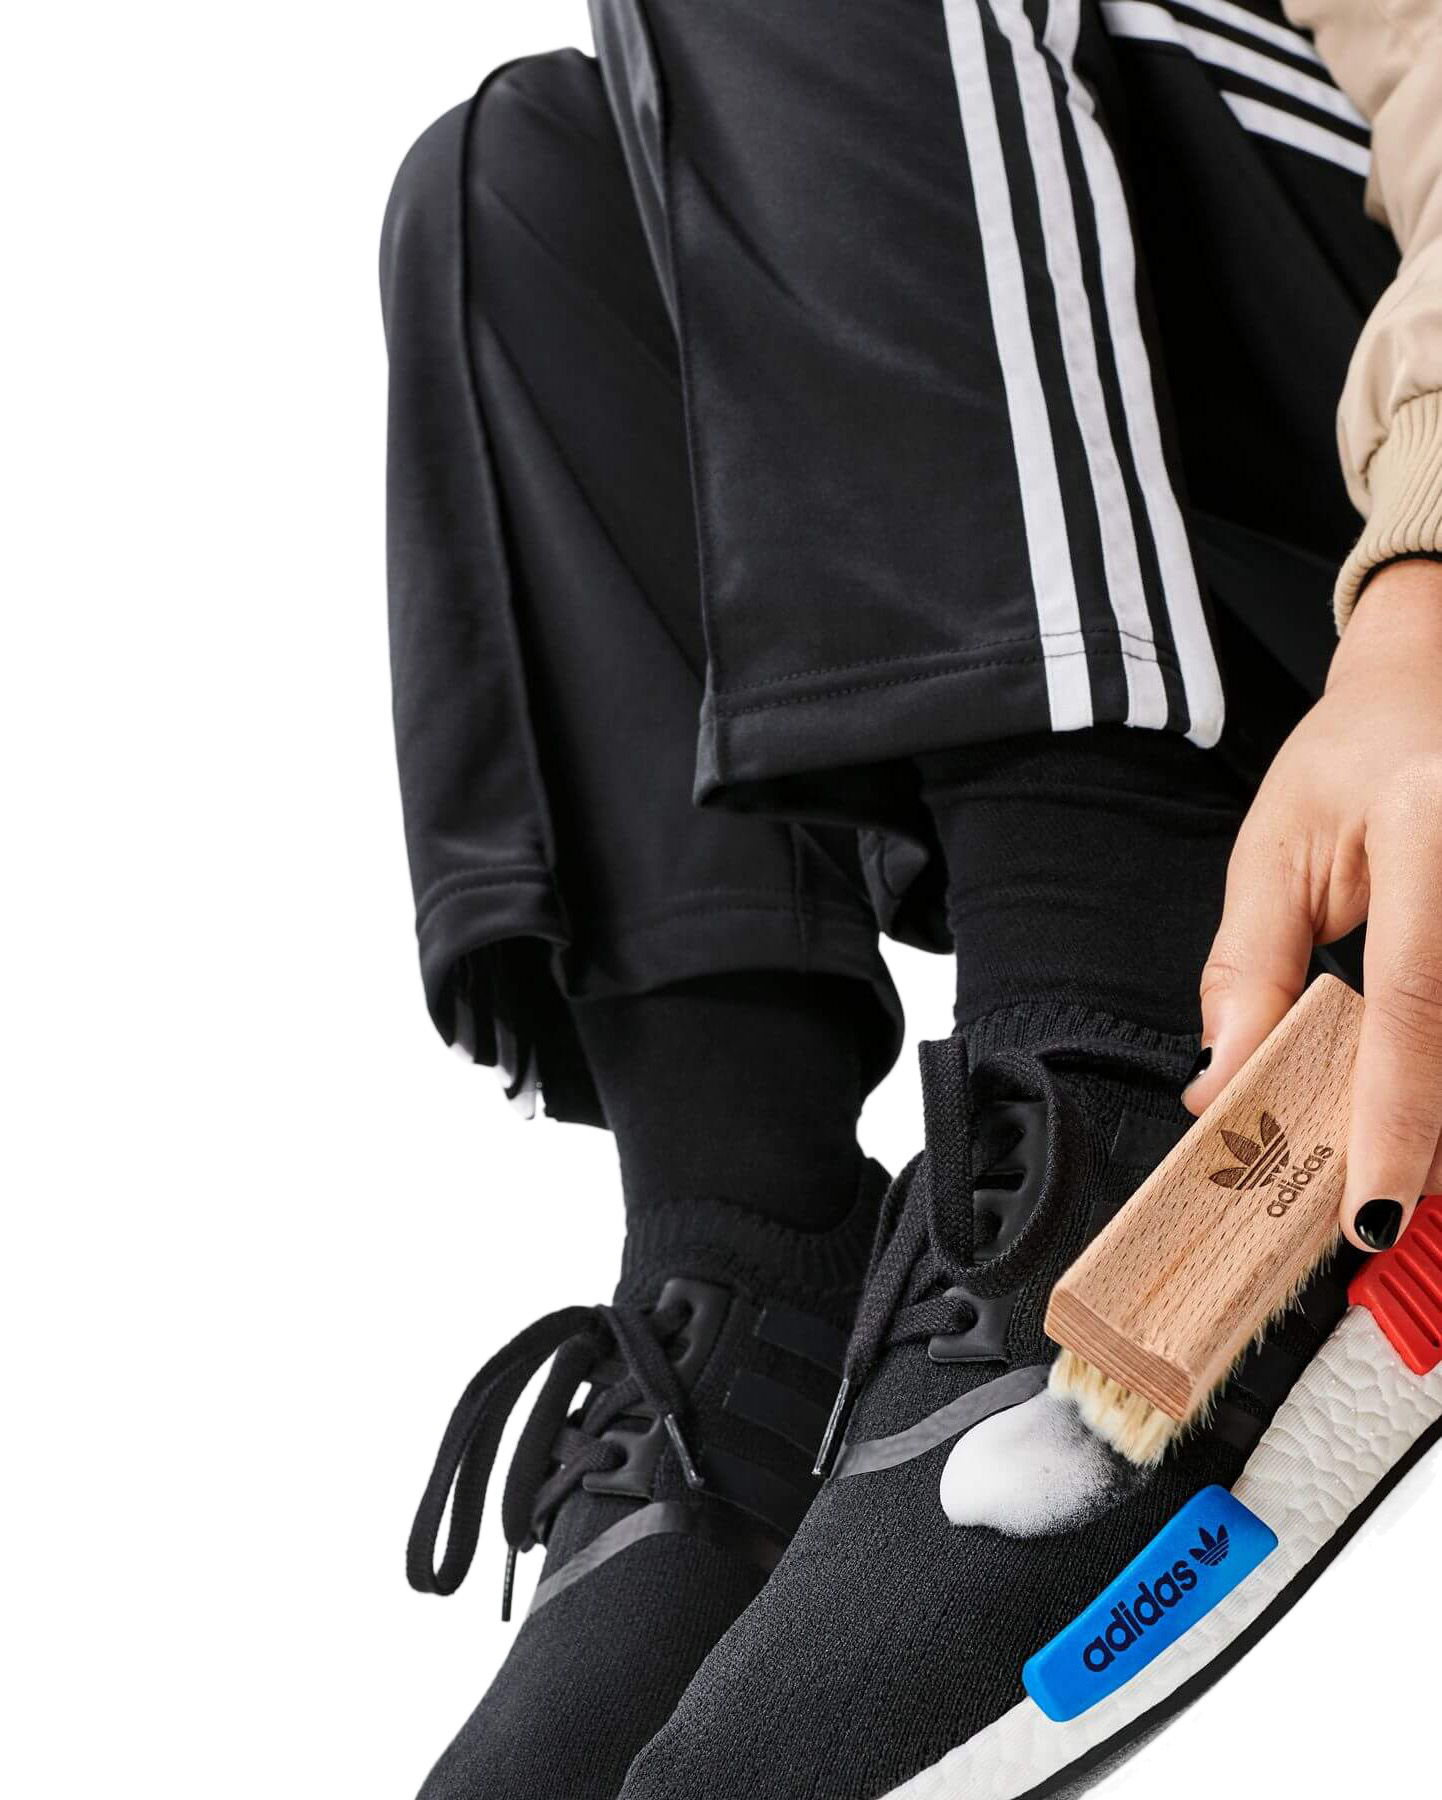 adidas NMD Boost Reinigung - adidas Shoe Care - Sneaker Foam Cleaner